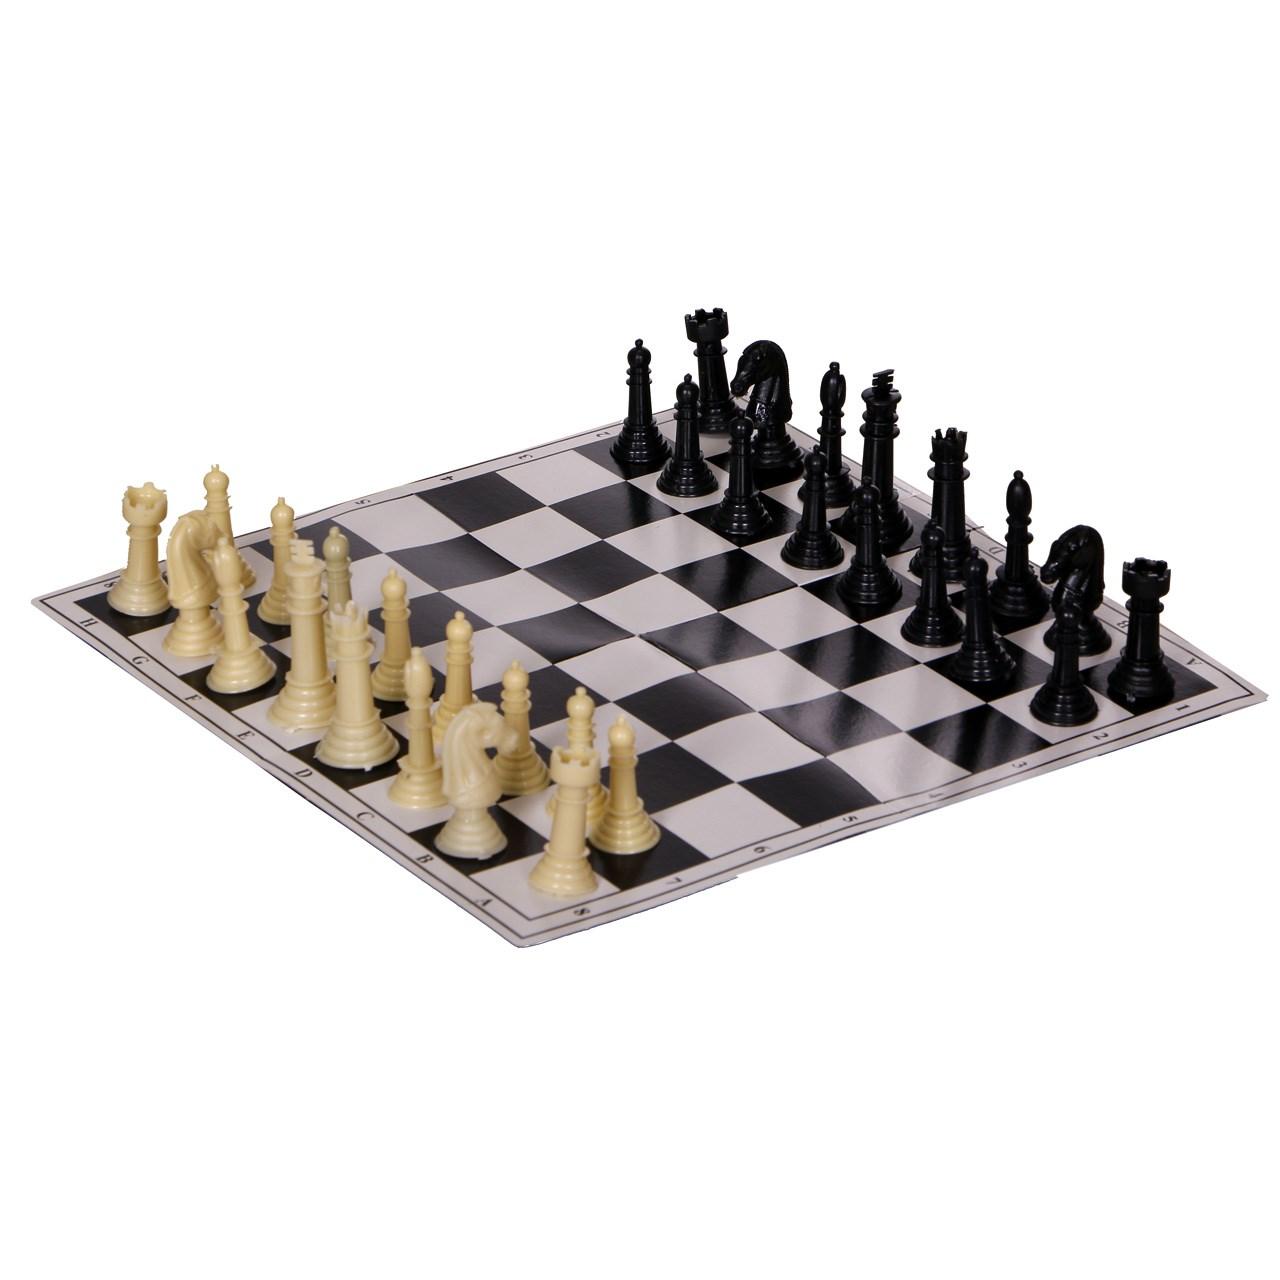 شطرنج ترنم مدل Tehran